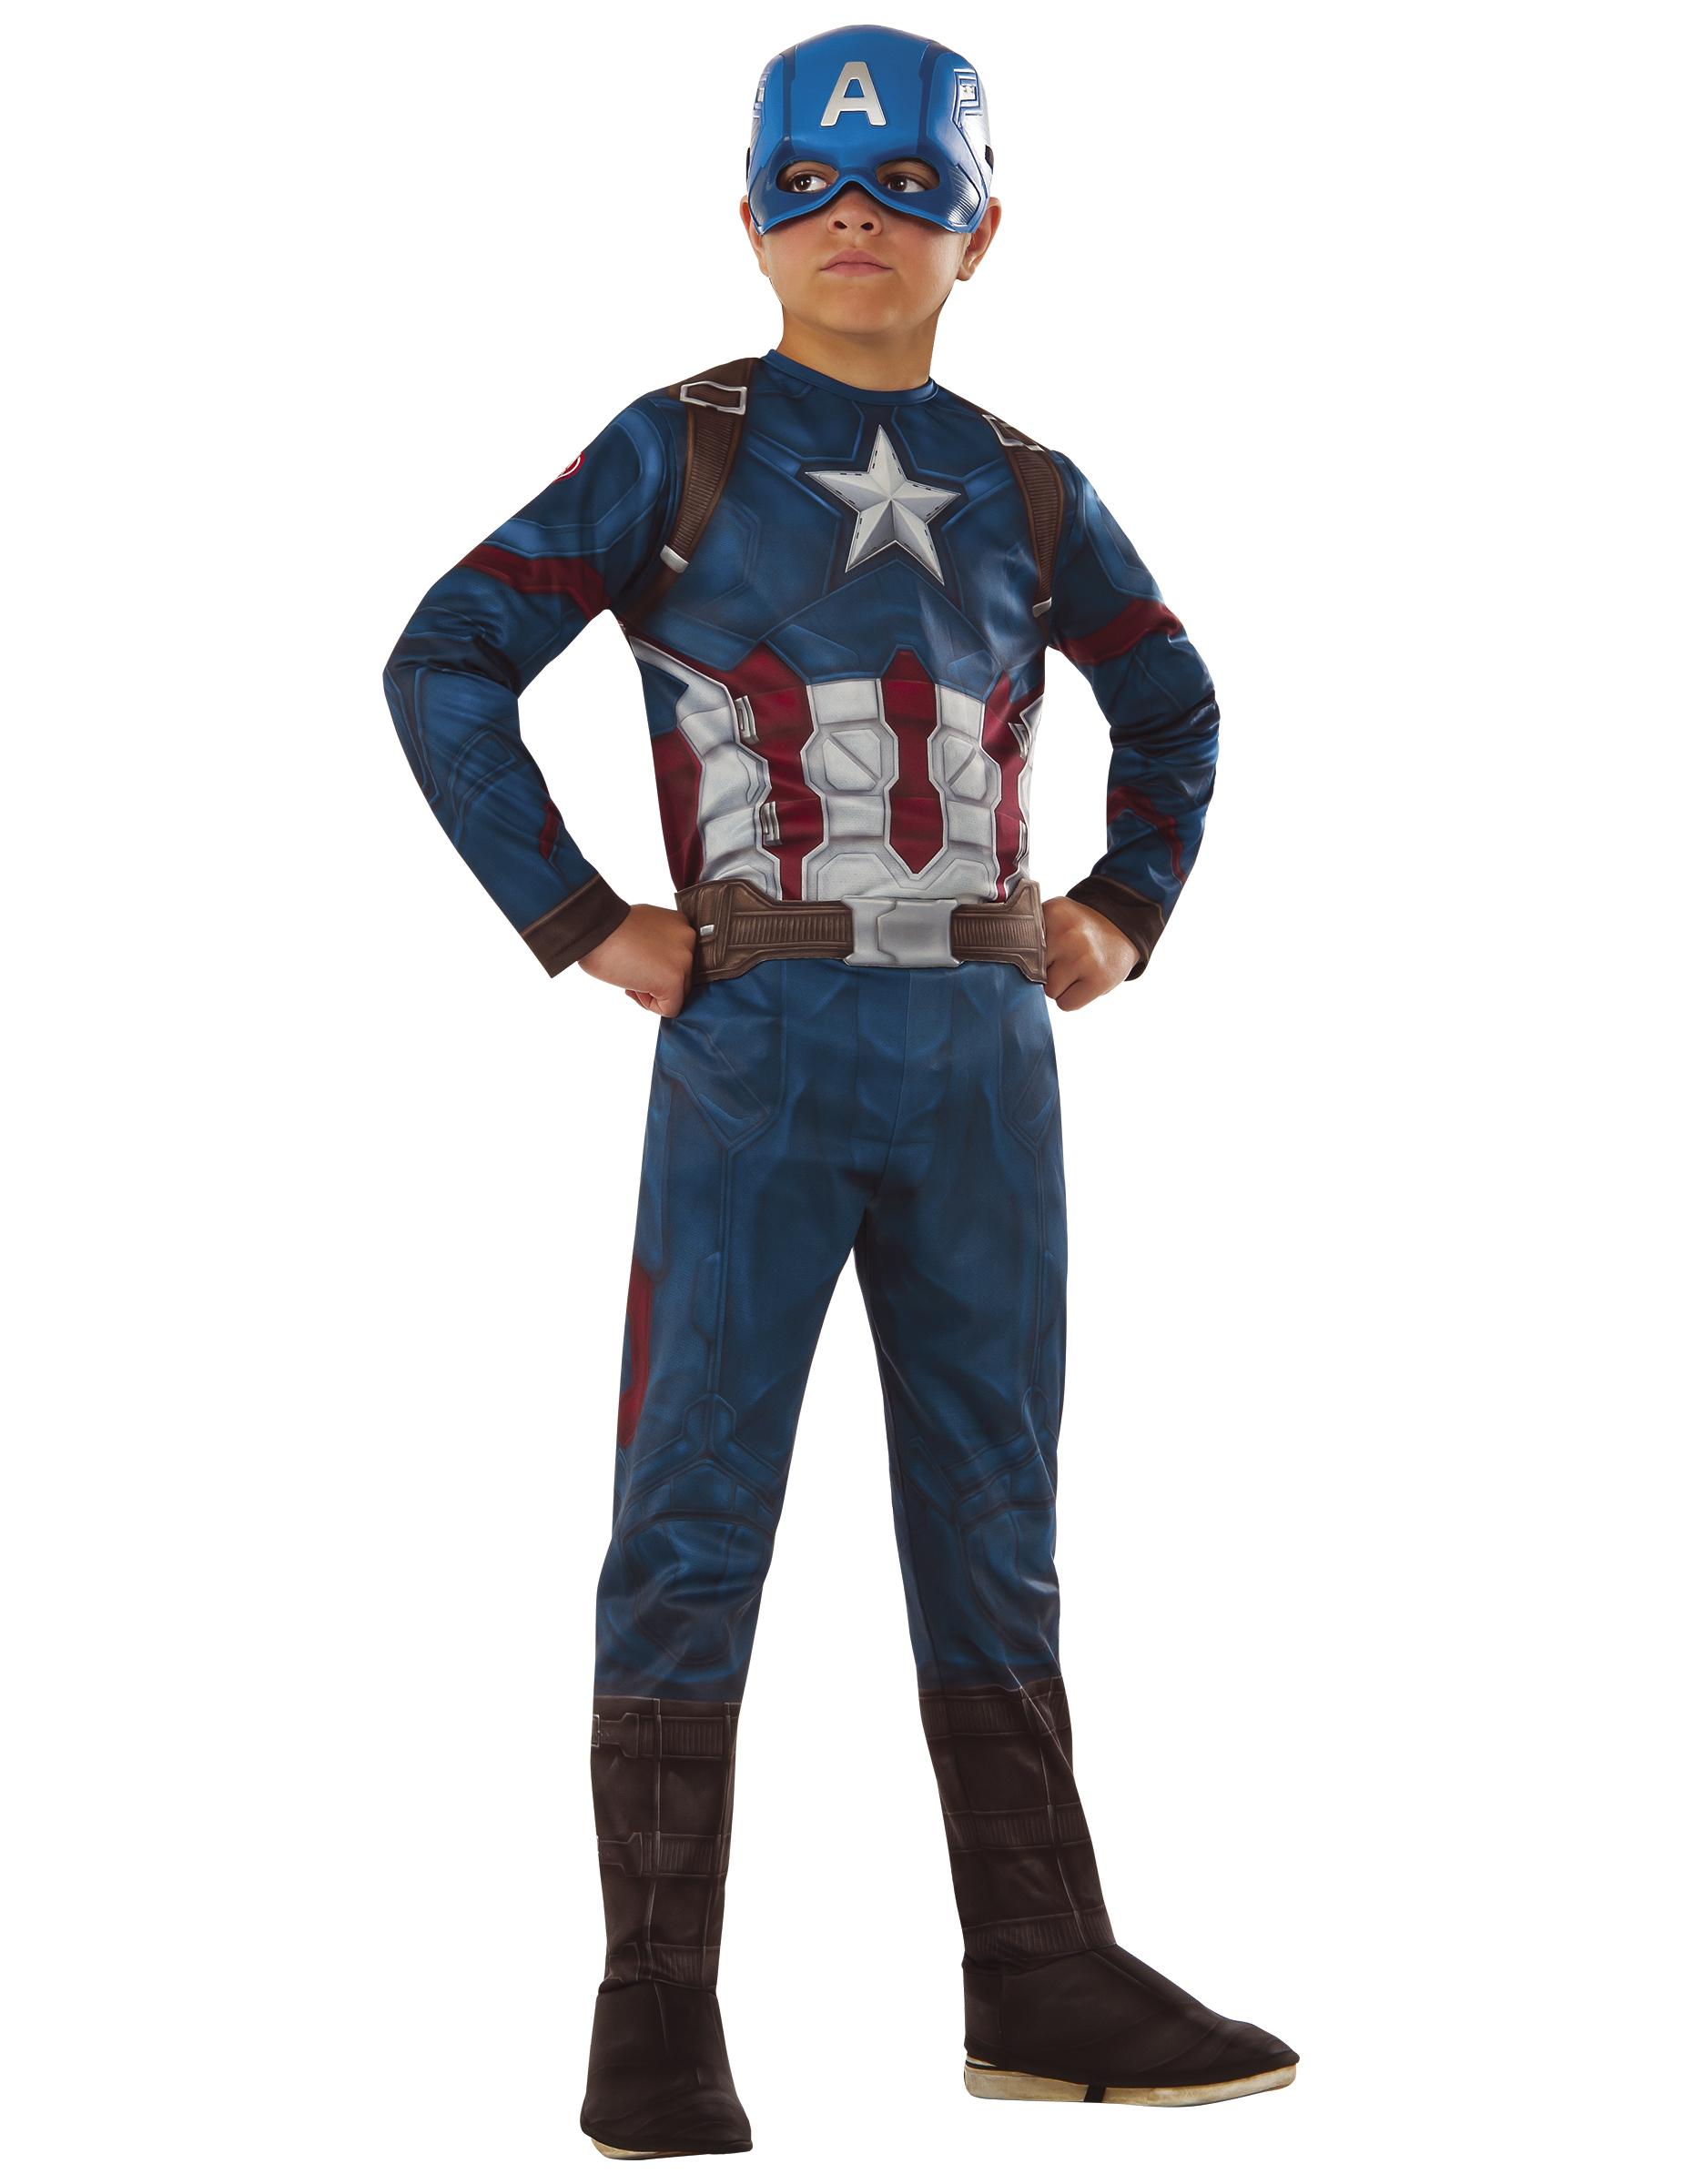 Verbazingwekkend Avengers Civil War™ Captain America™ pak voor jongens - Vegaoo.nl NN-75